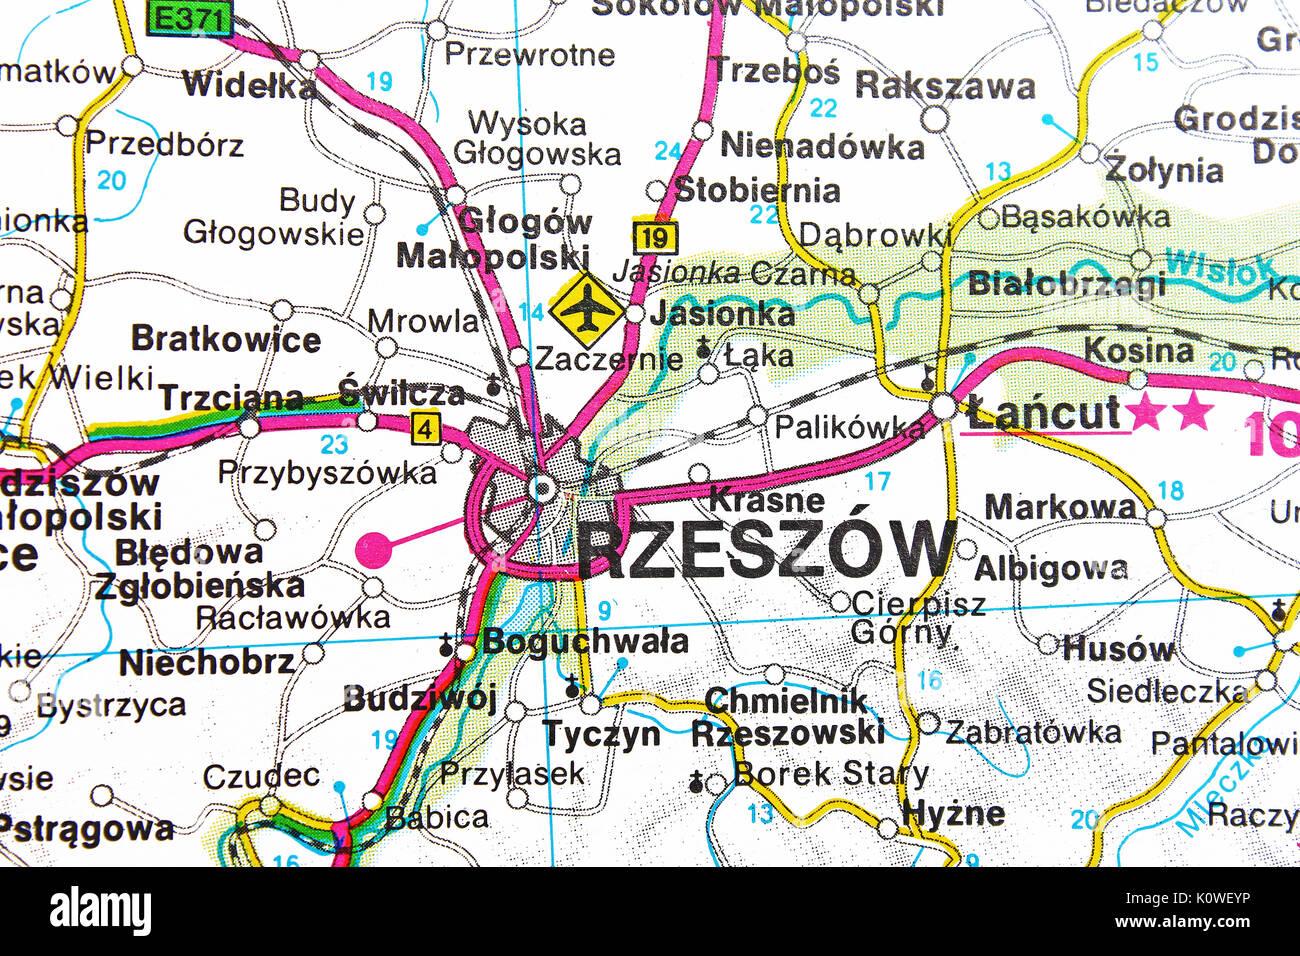 Rzeszow Map City Map Road Map Stock Photo 155453866 Alamy